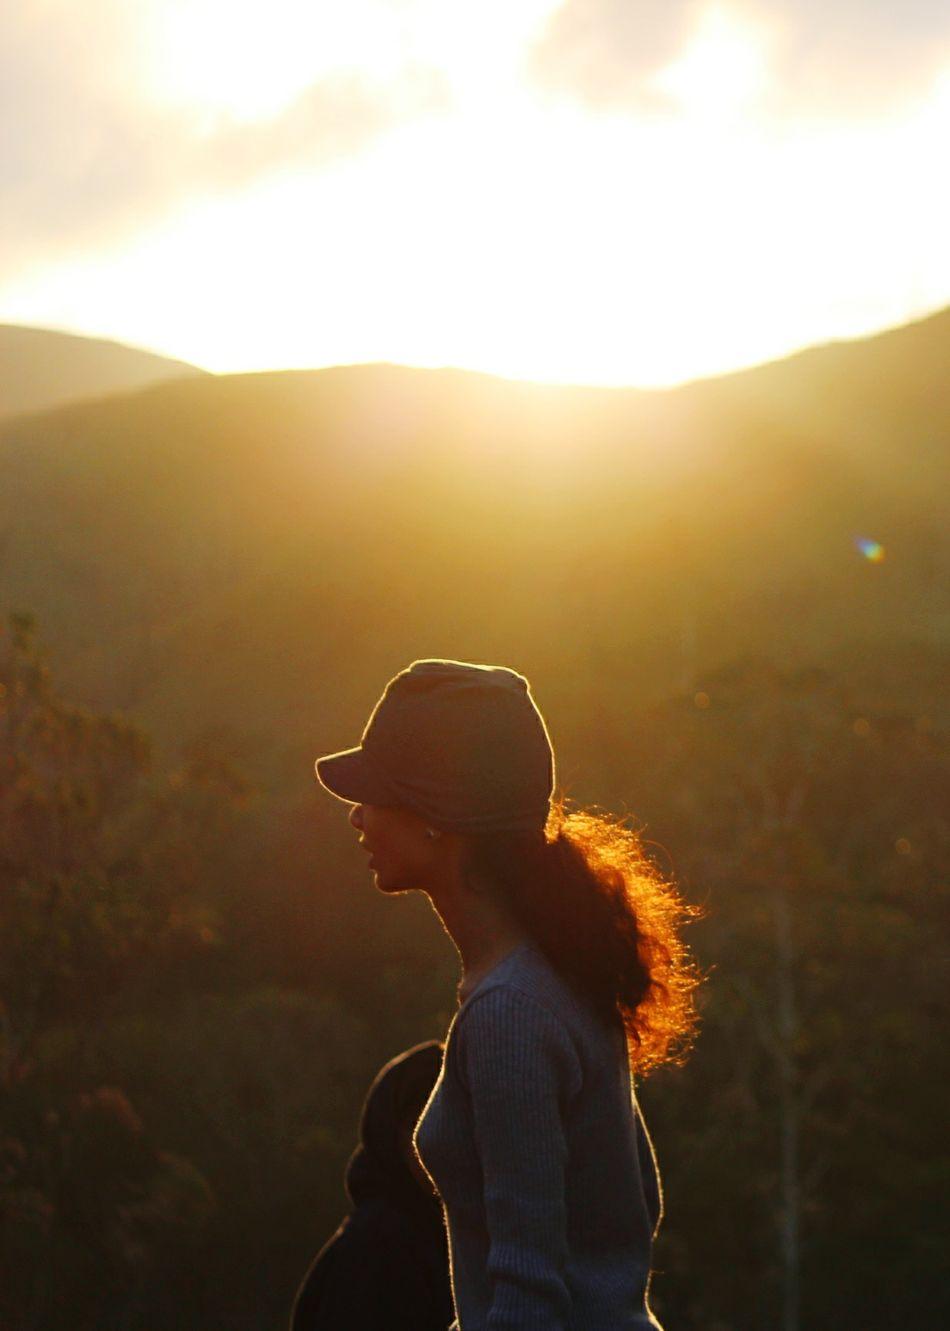 Perfect_sun_rise Young Girl Candid Portraits Kerala Sunrise Photography Morining Refreshment Sumedha